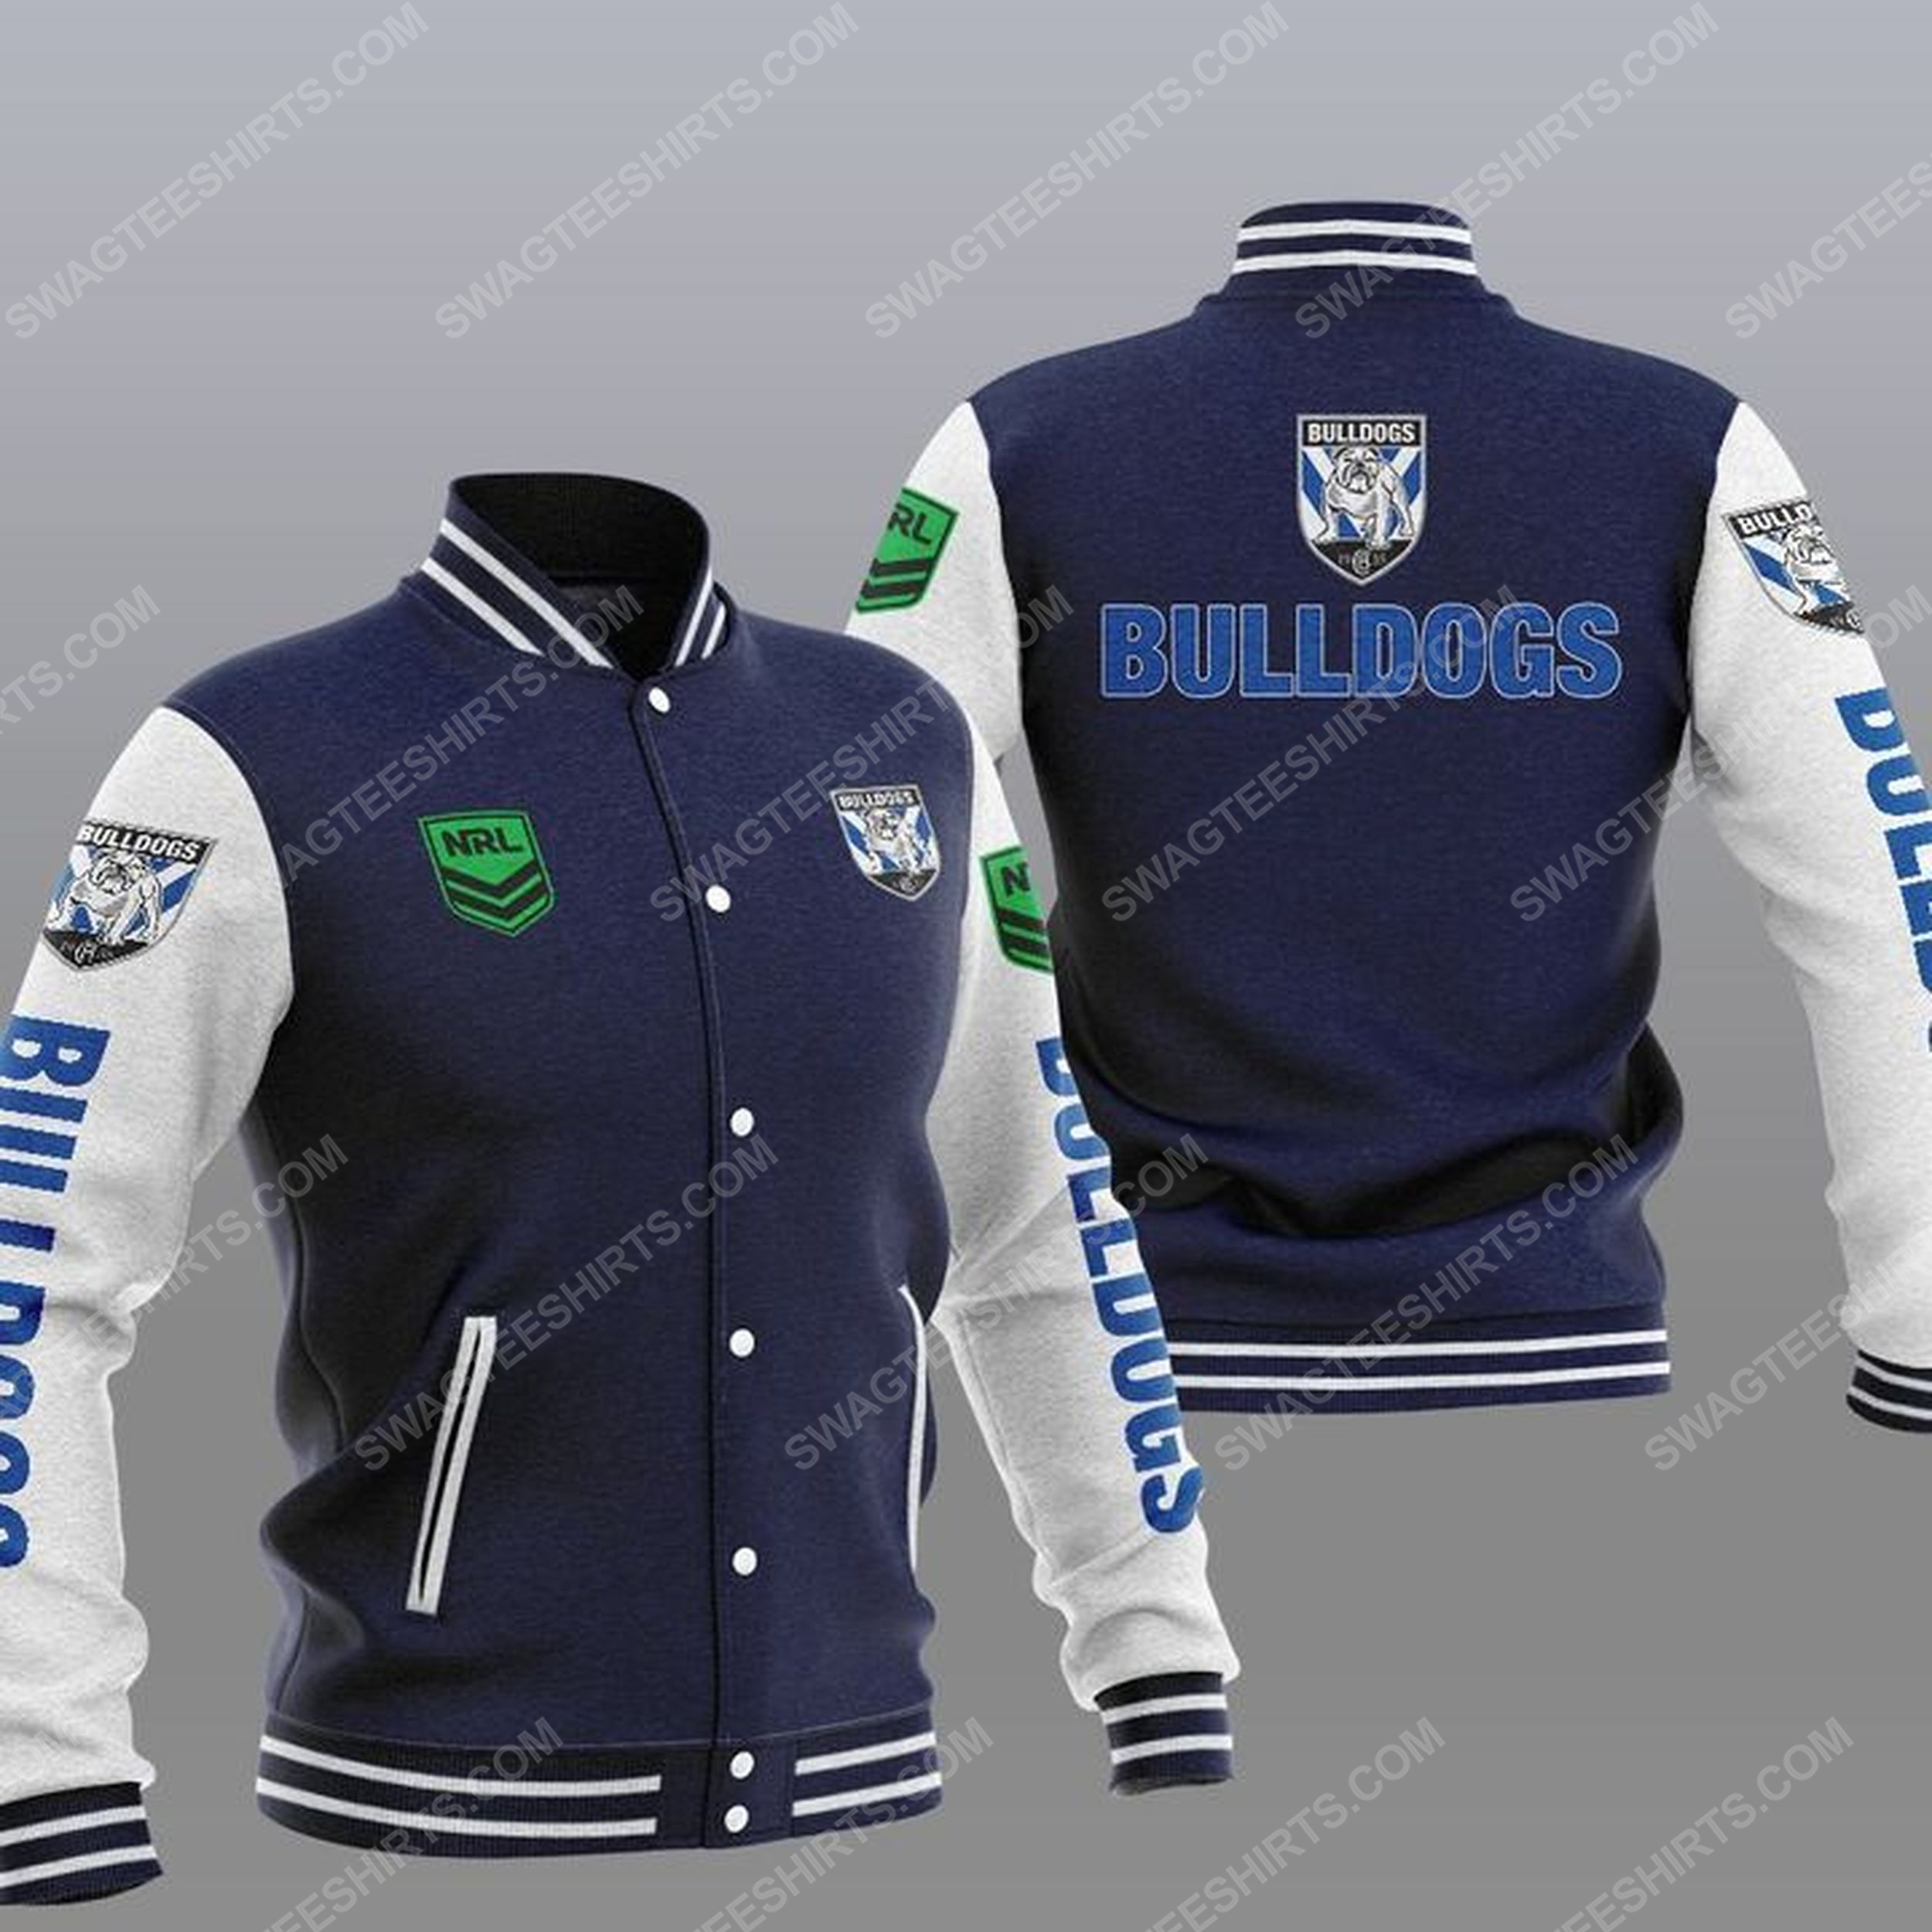 Canterbury-bankstown bulldogs all over print baseball jacket - navy 1